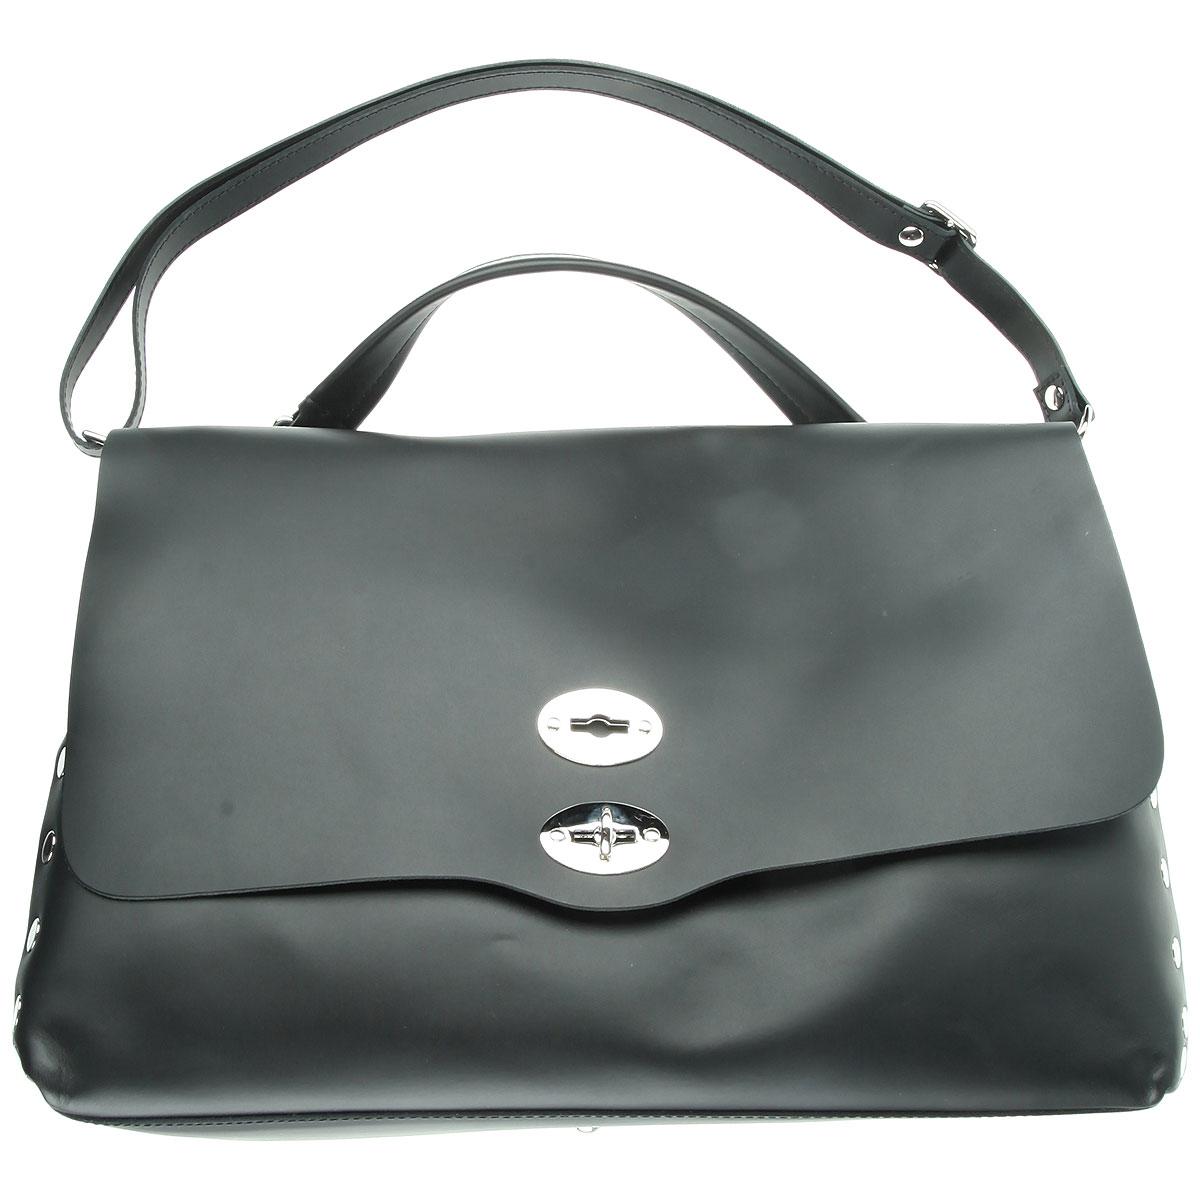 Image of Zanellato Top Handle Handbag, Black, Leather, 2017